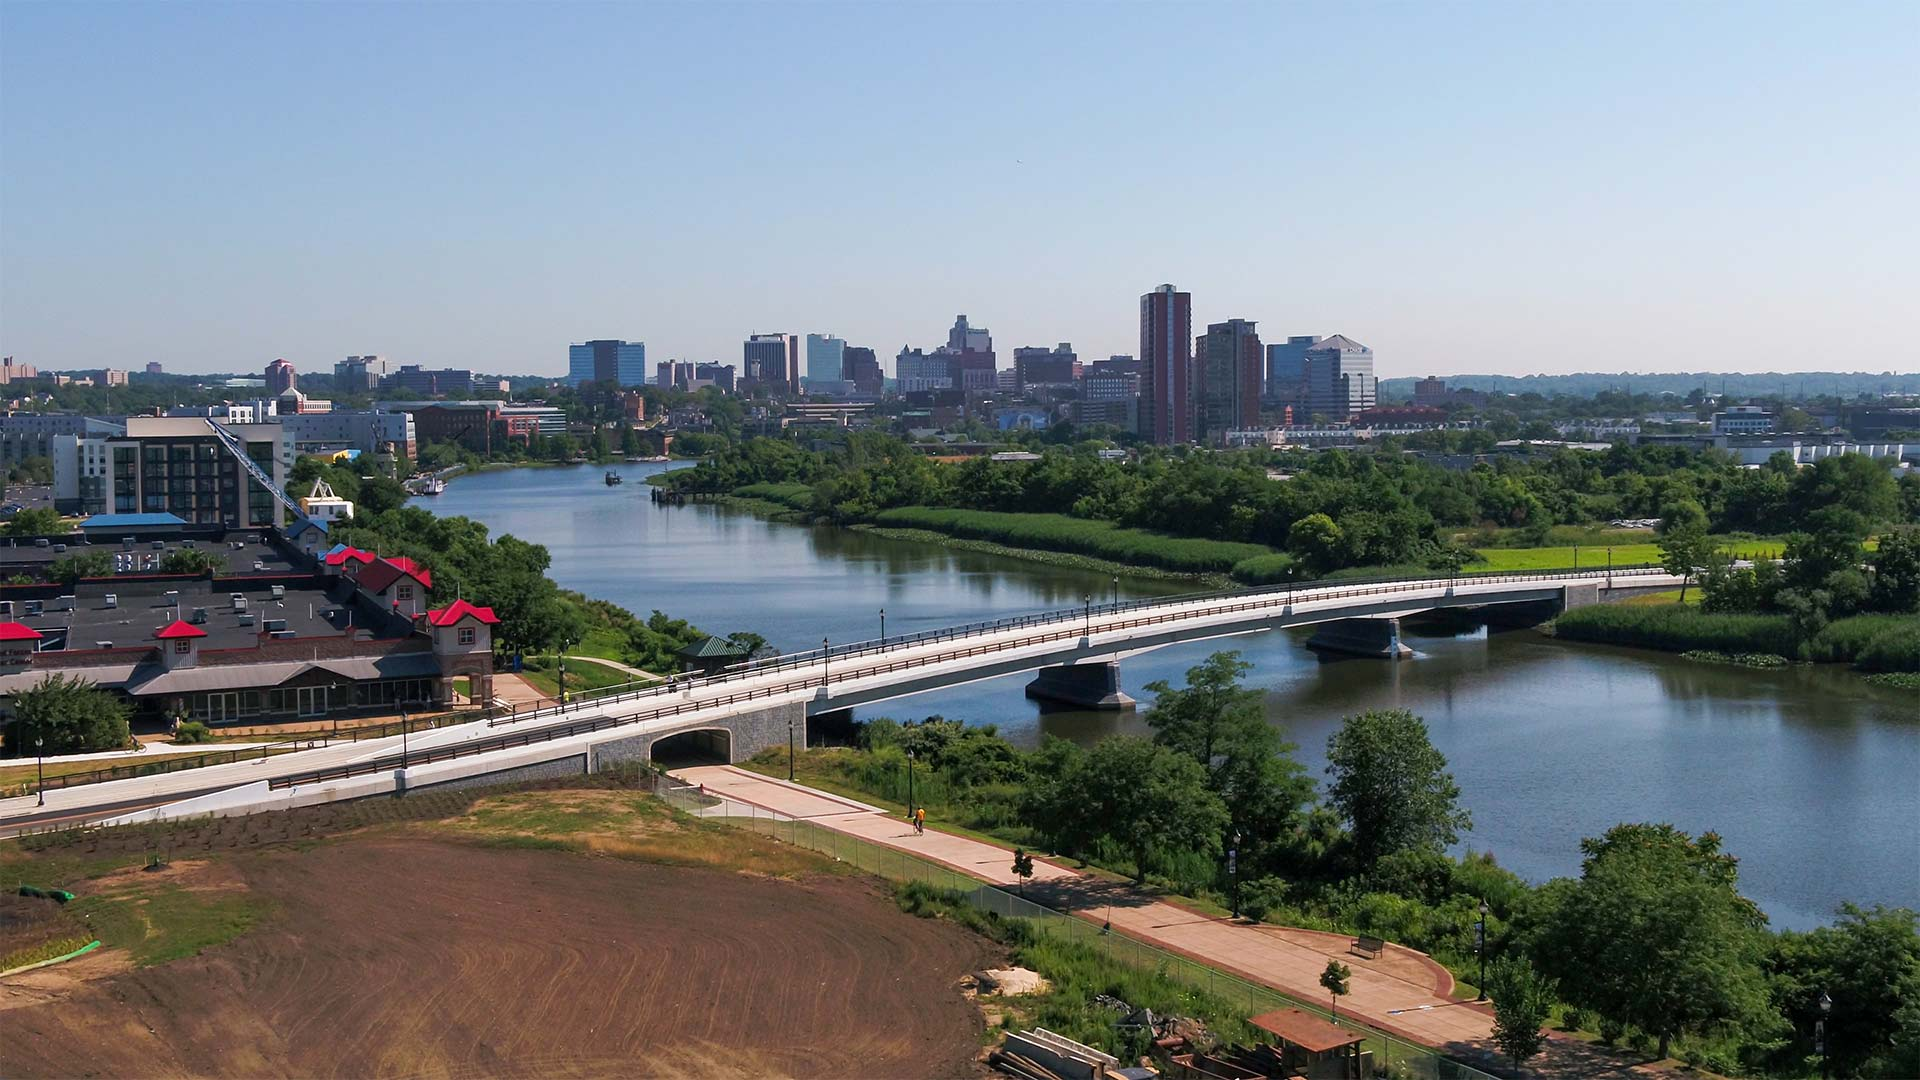 Senator Margaret Rose Henry Bridge Wins America's Transportation Award